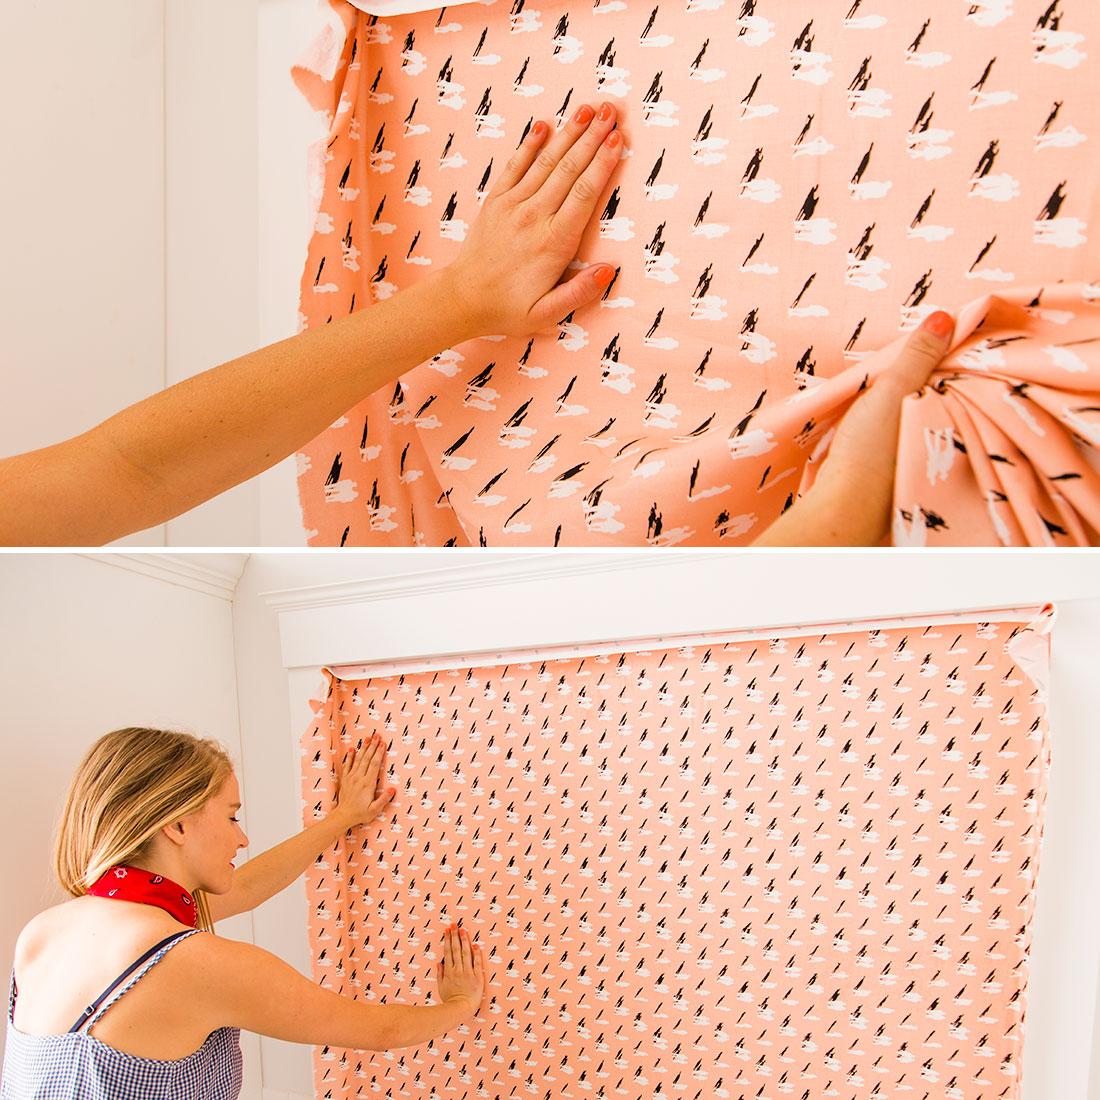 07-faca-voce-mesmo-use-tecido-como-papel-de-parede